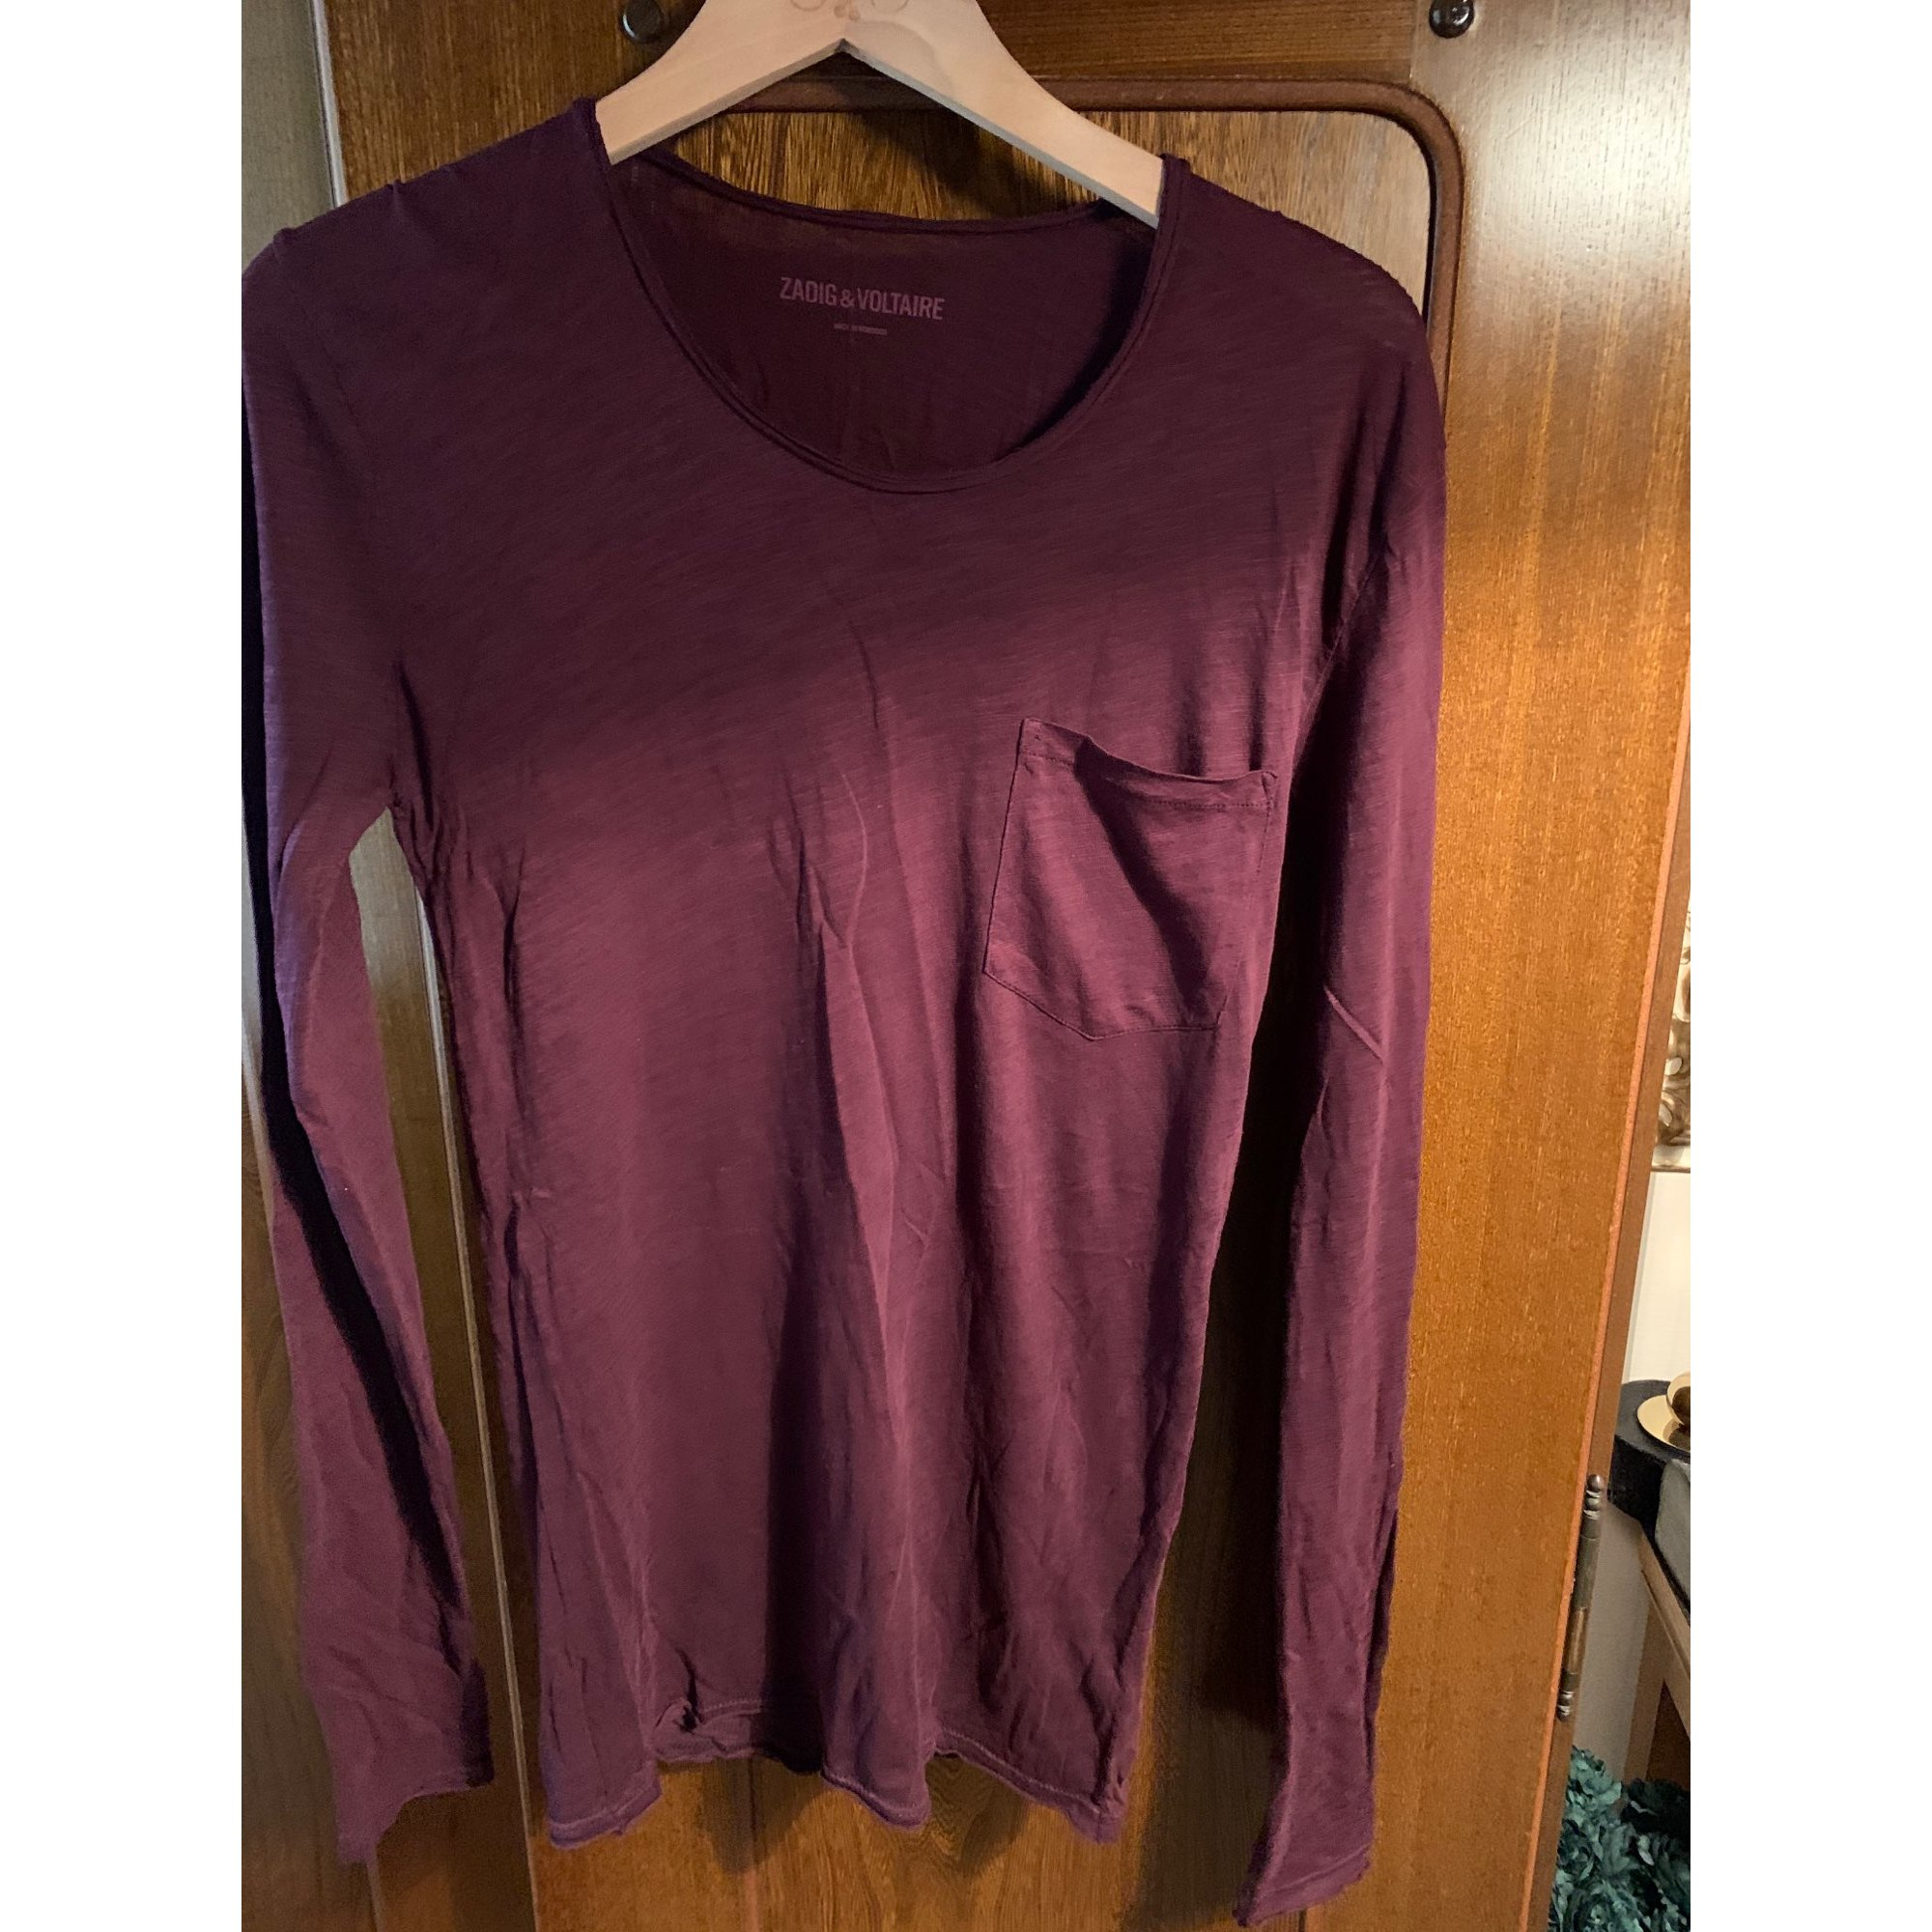 Tee-shirt ZADIG & VOLTAIRE Rouge, bordeaux